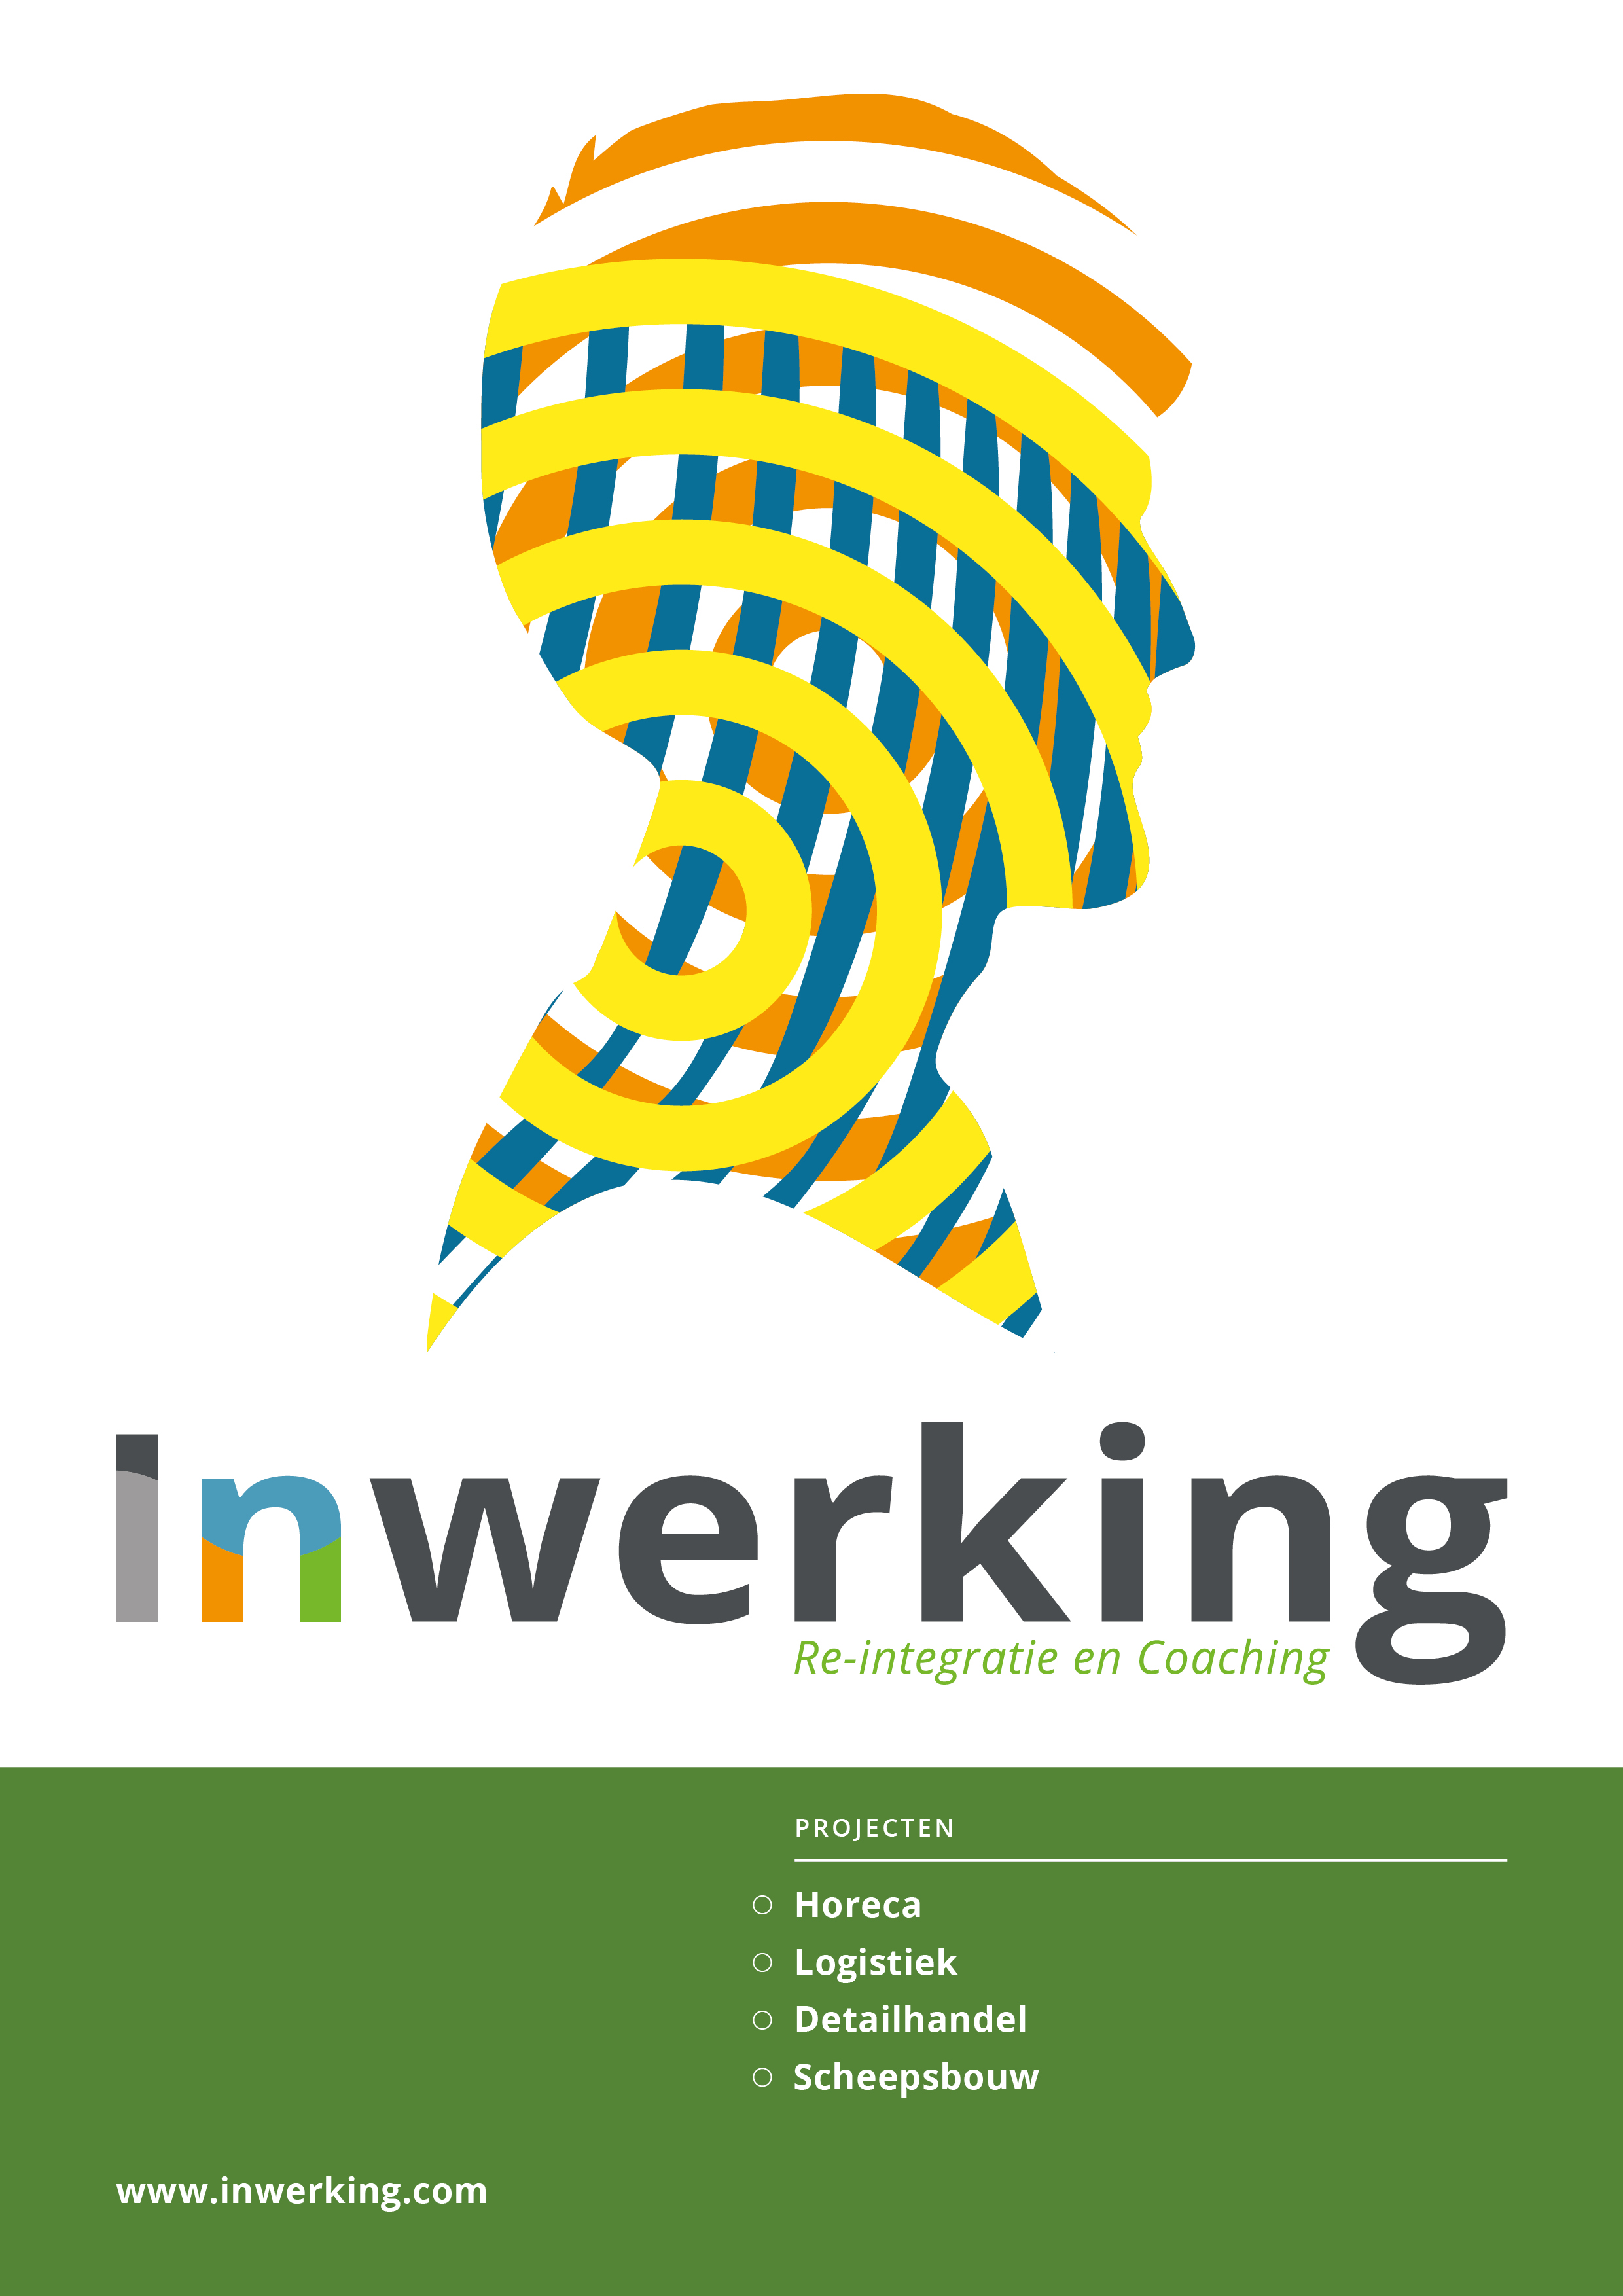 Inwerking-2018-A4-Brochure-PROJECTEN